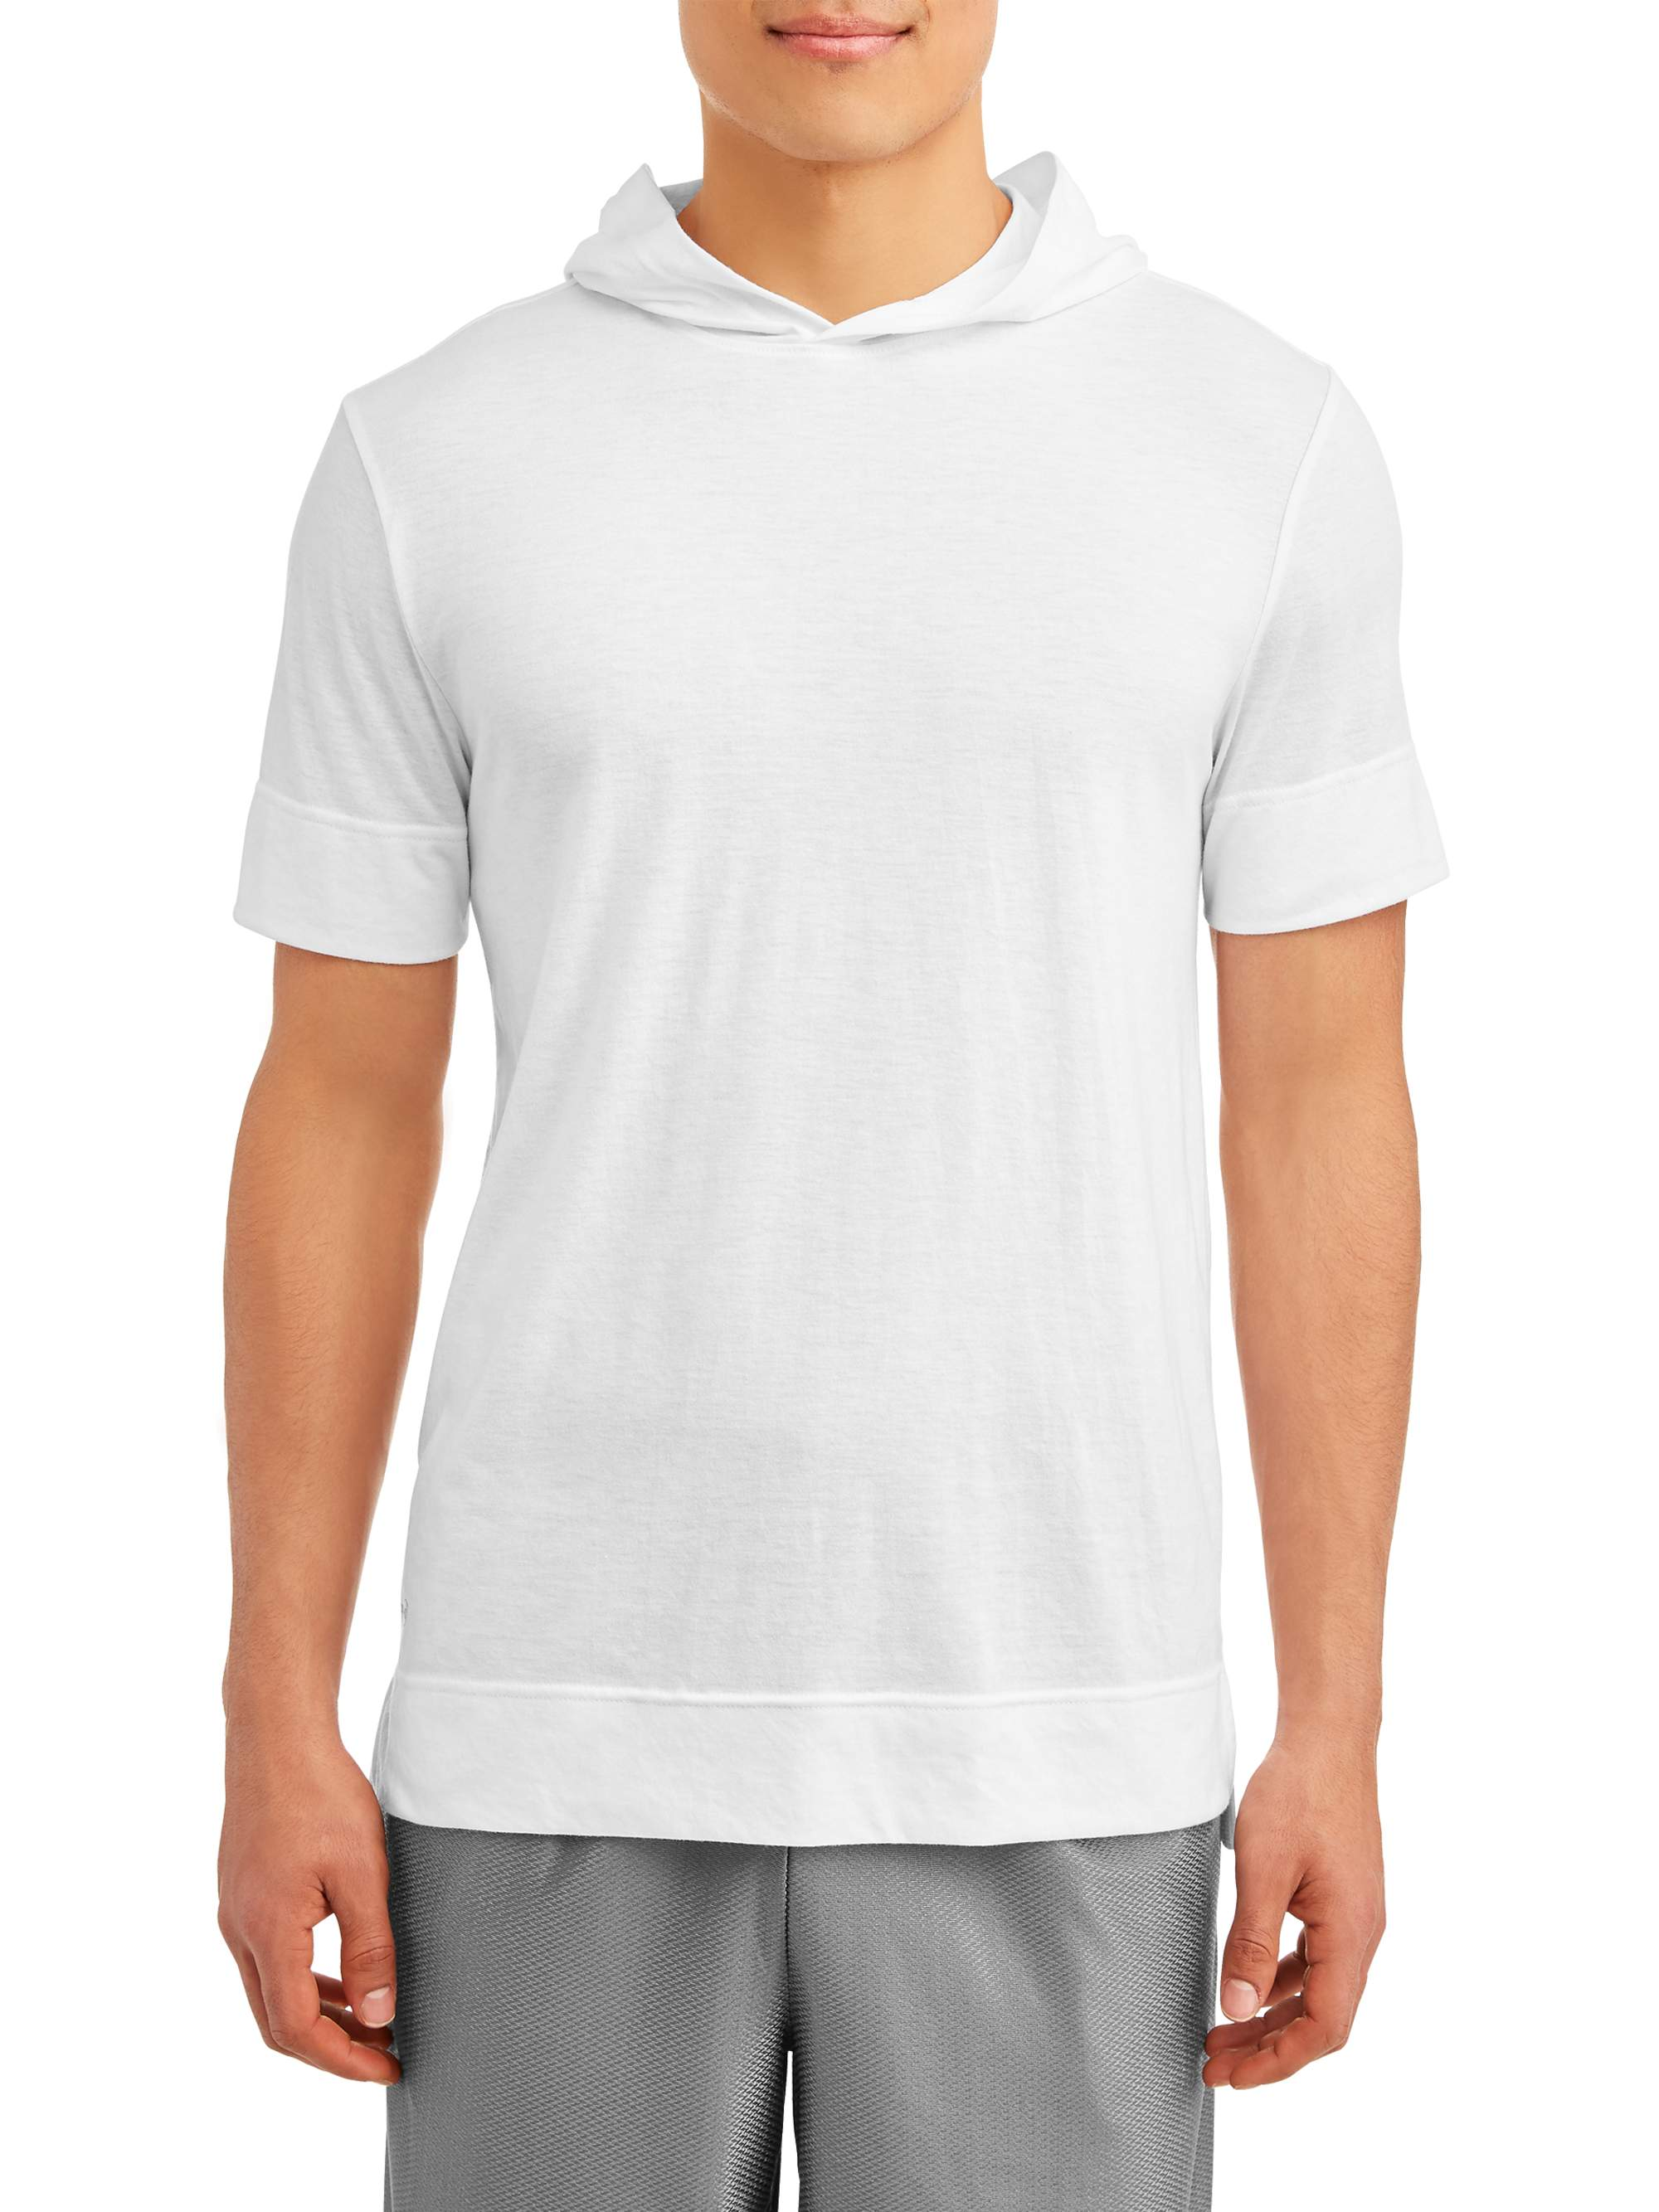 Russell Exclusive Big Men's Short Sleeve Hooded Top